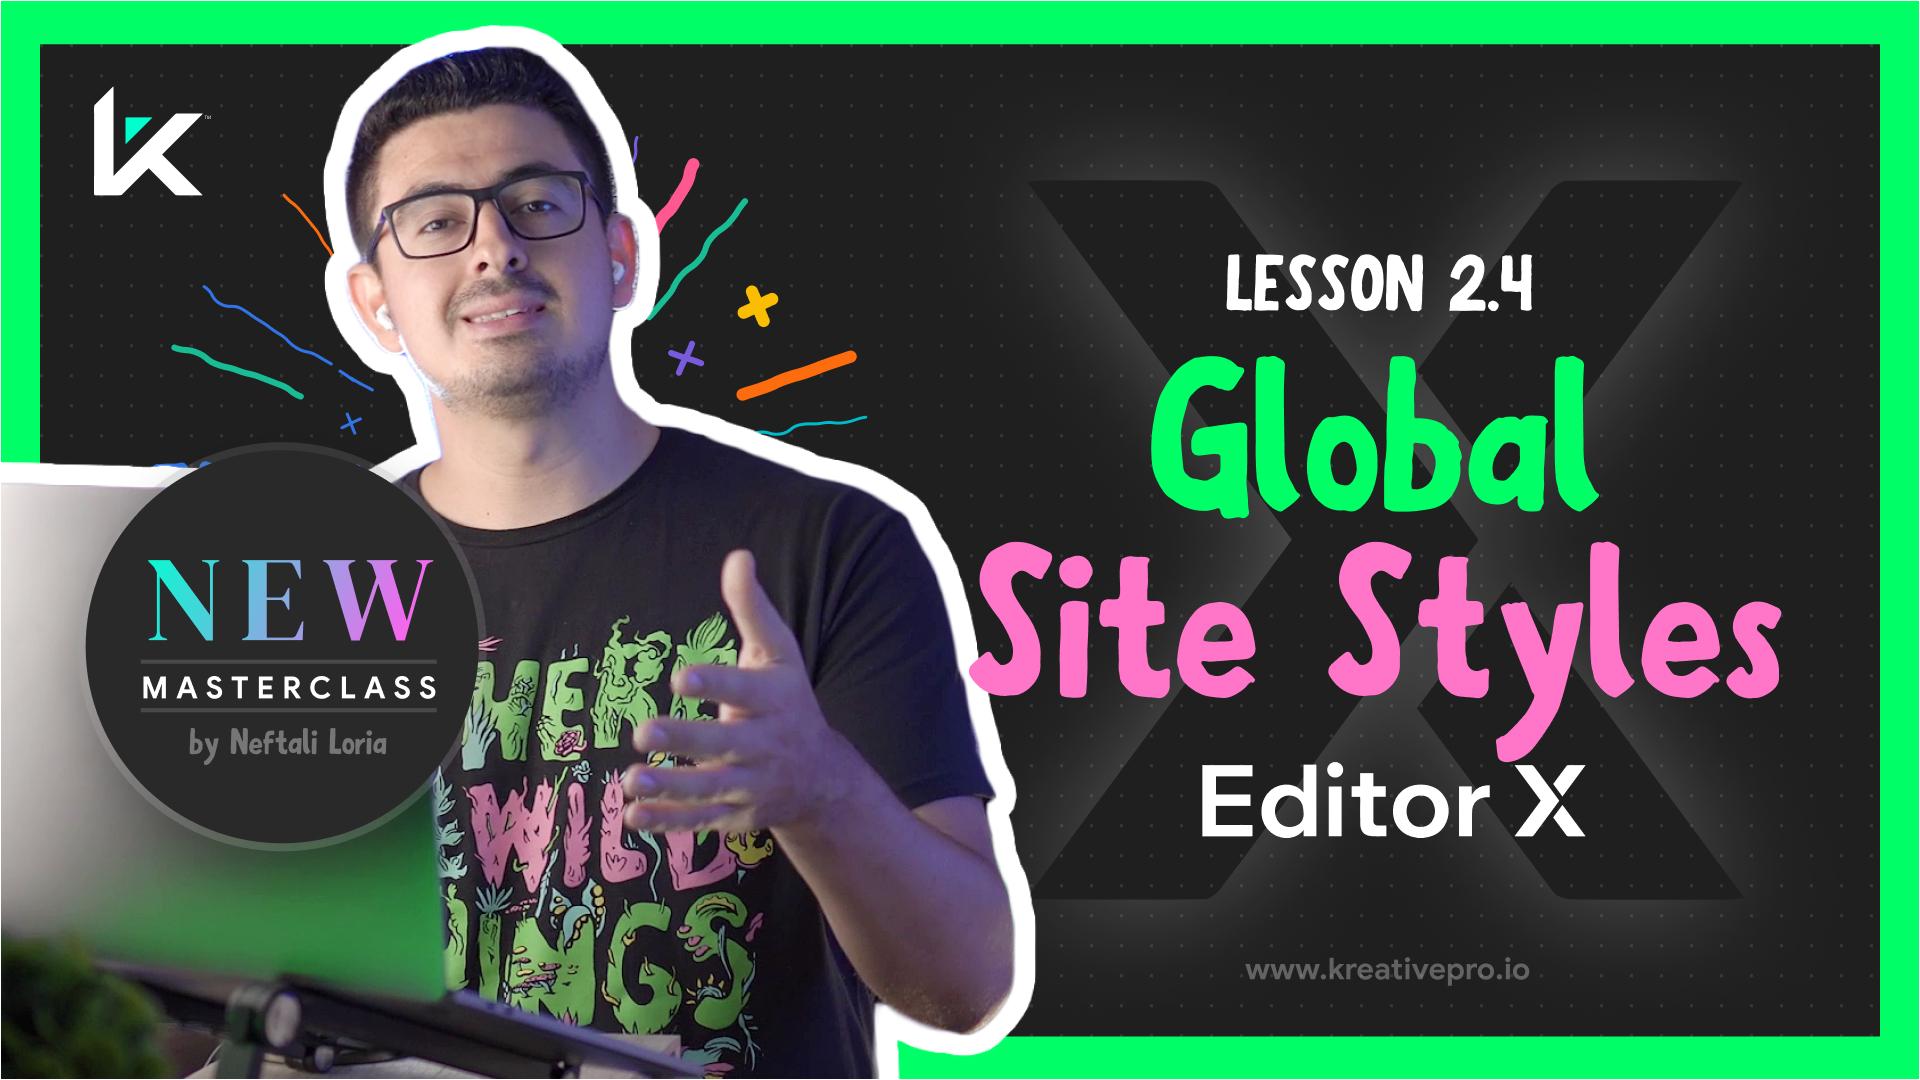 Editor X 2.4 - Editor X Site Styles